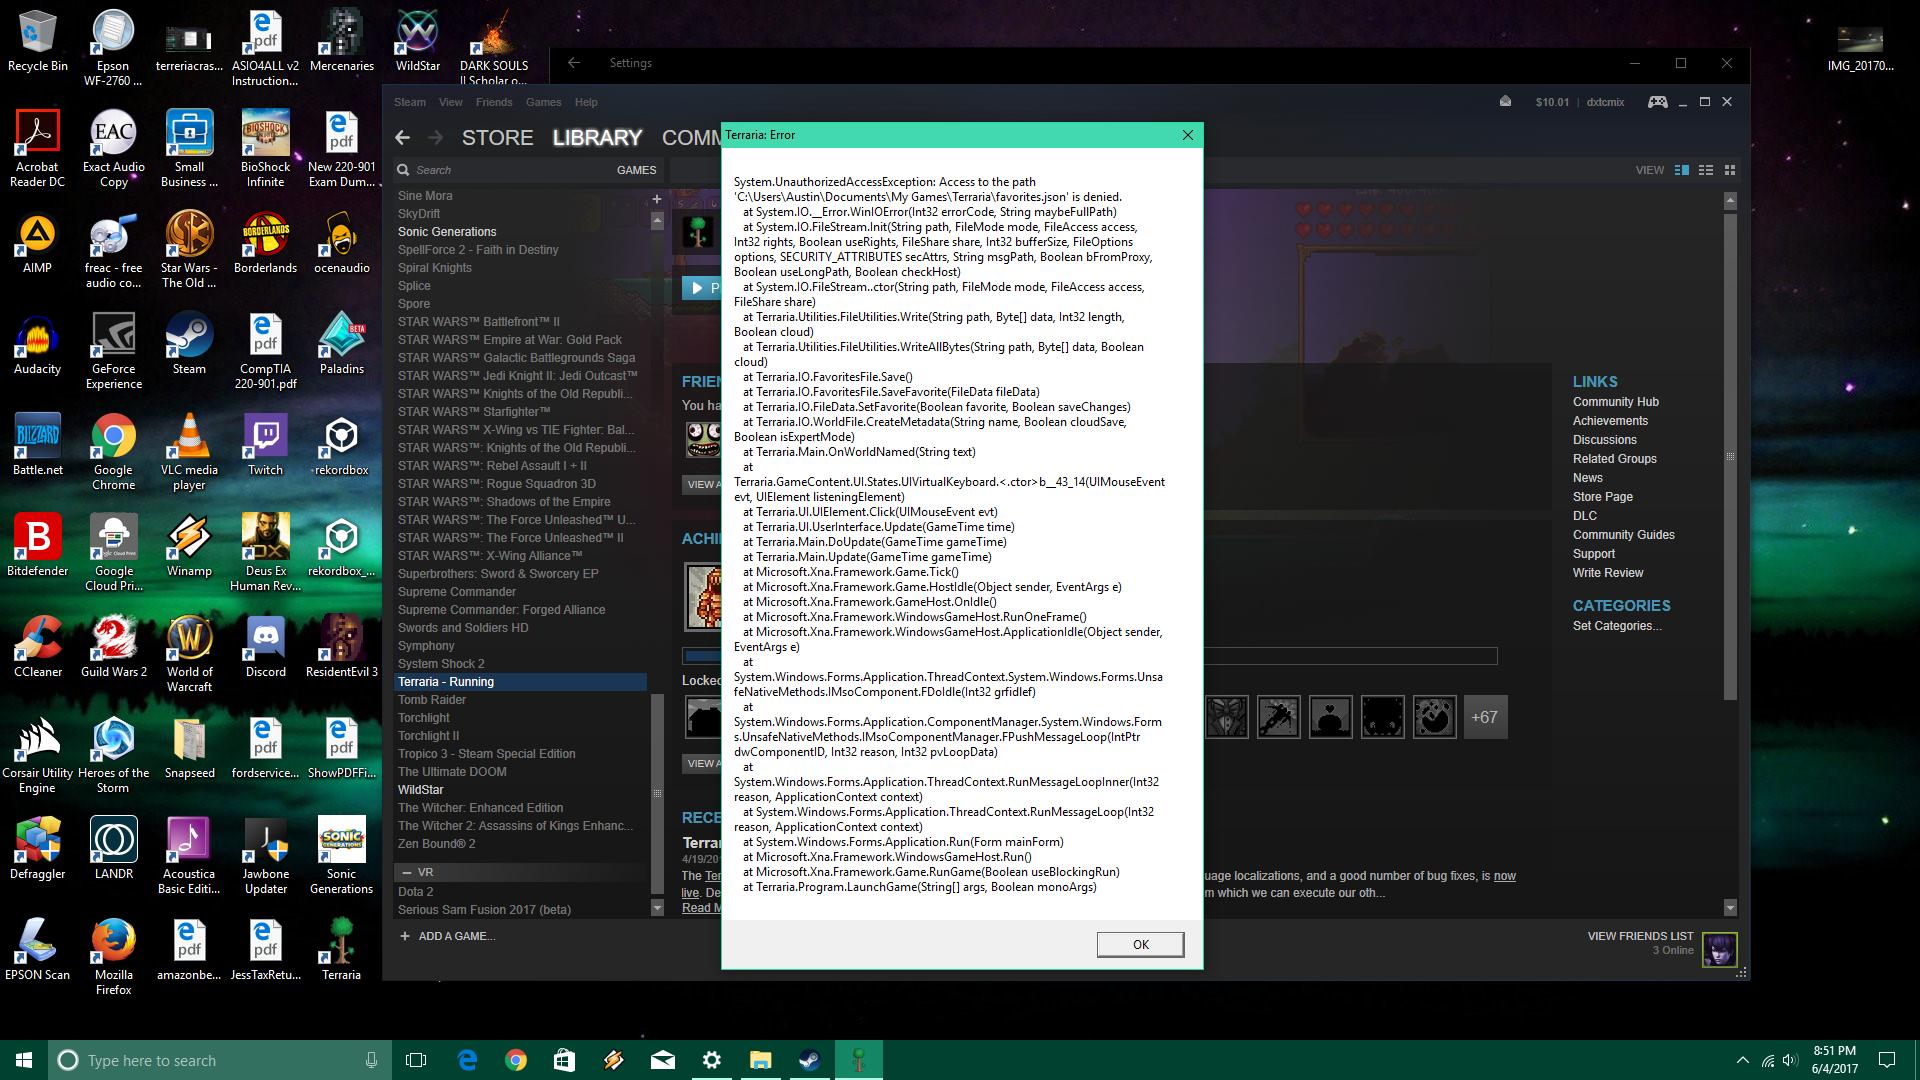 Terraria 1 3 5 on Steam Crashes (Windows 10 Creators Update x64